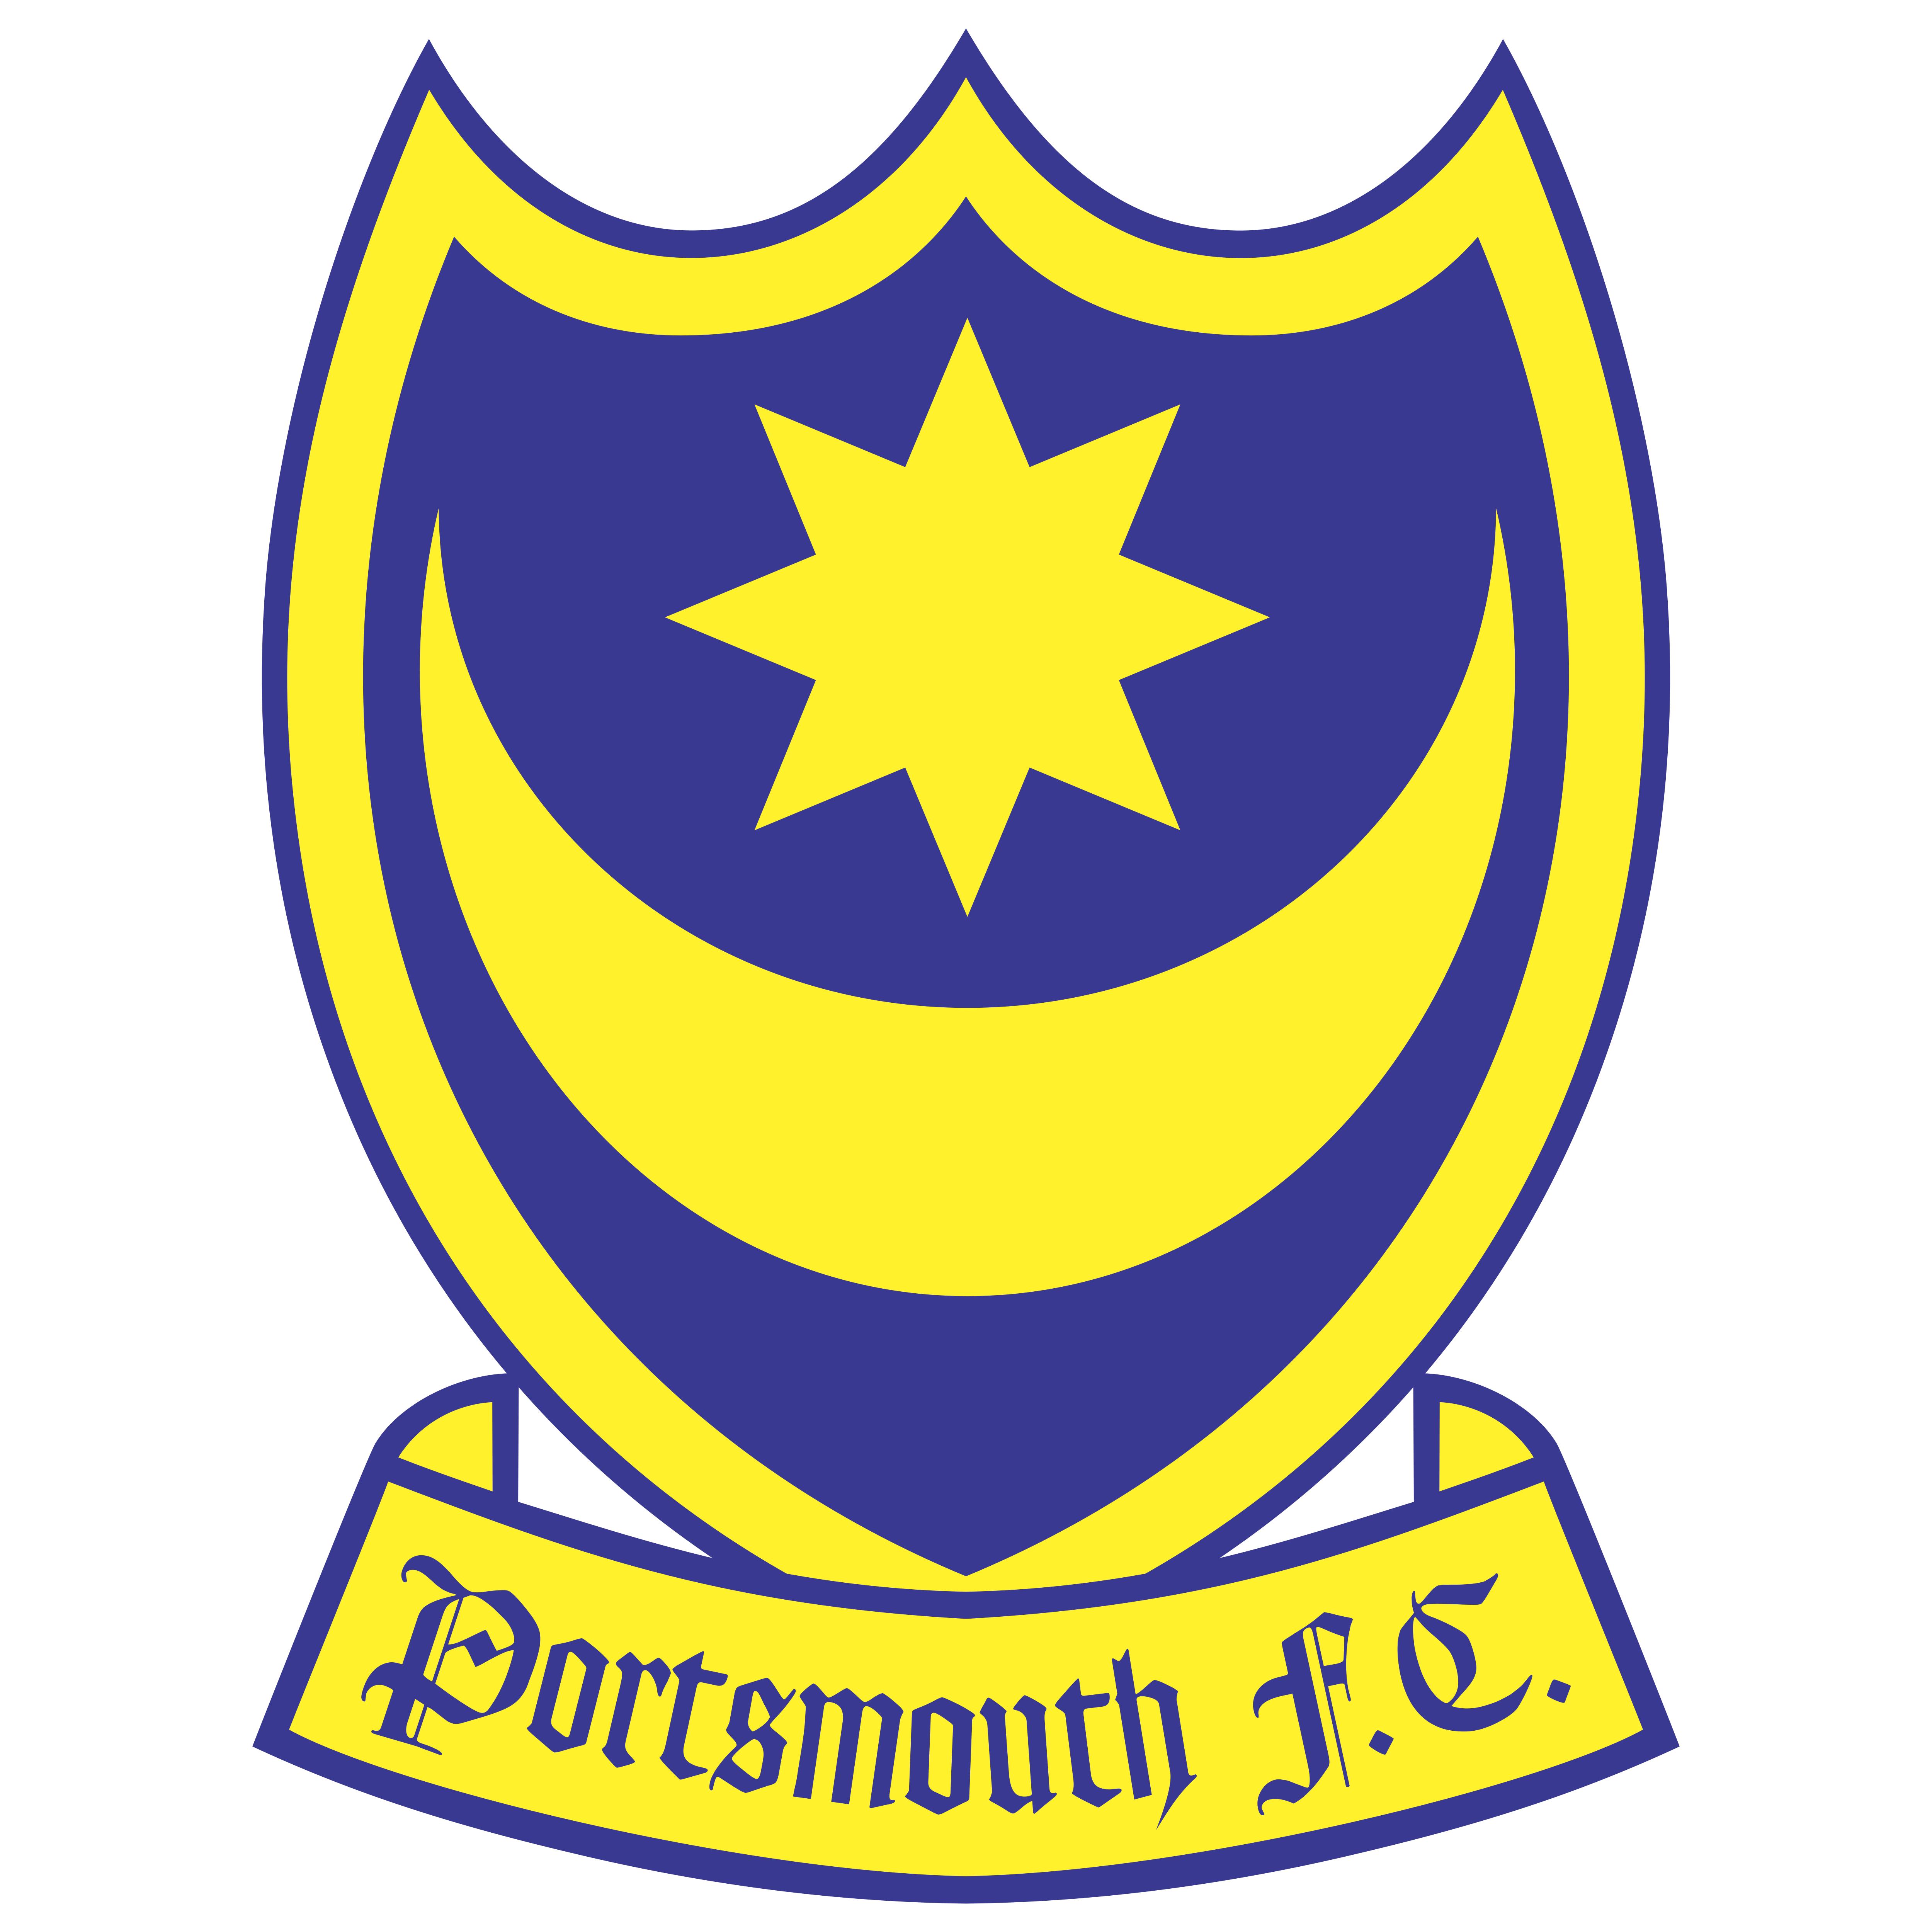 portsmouth fc logos download sport logo creation sports logo creator online free